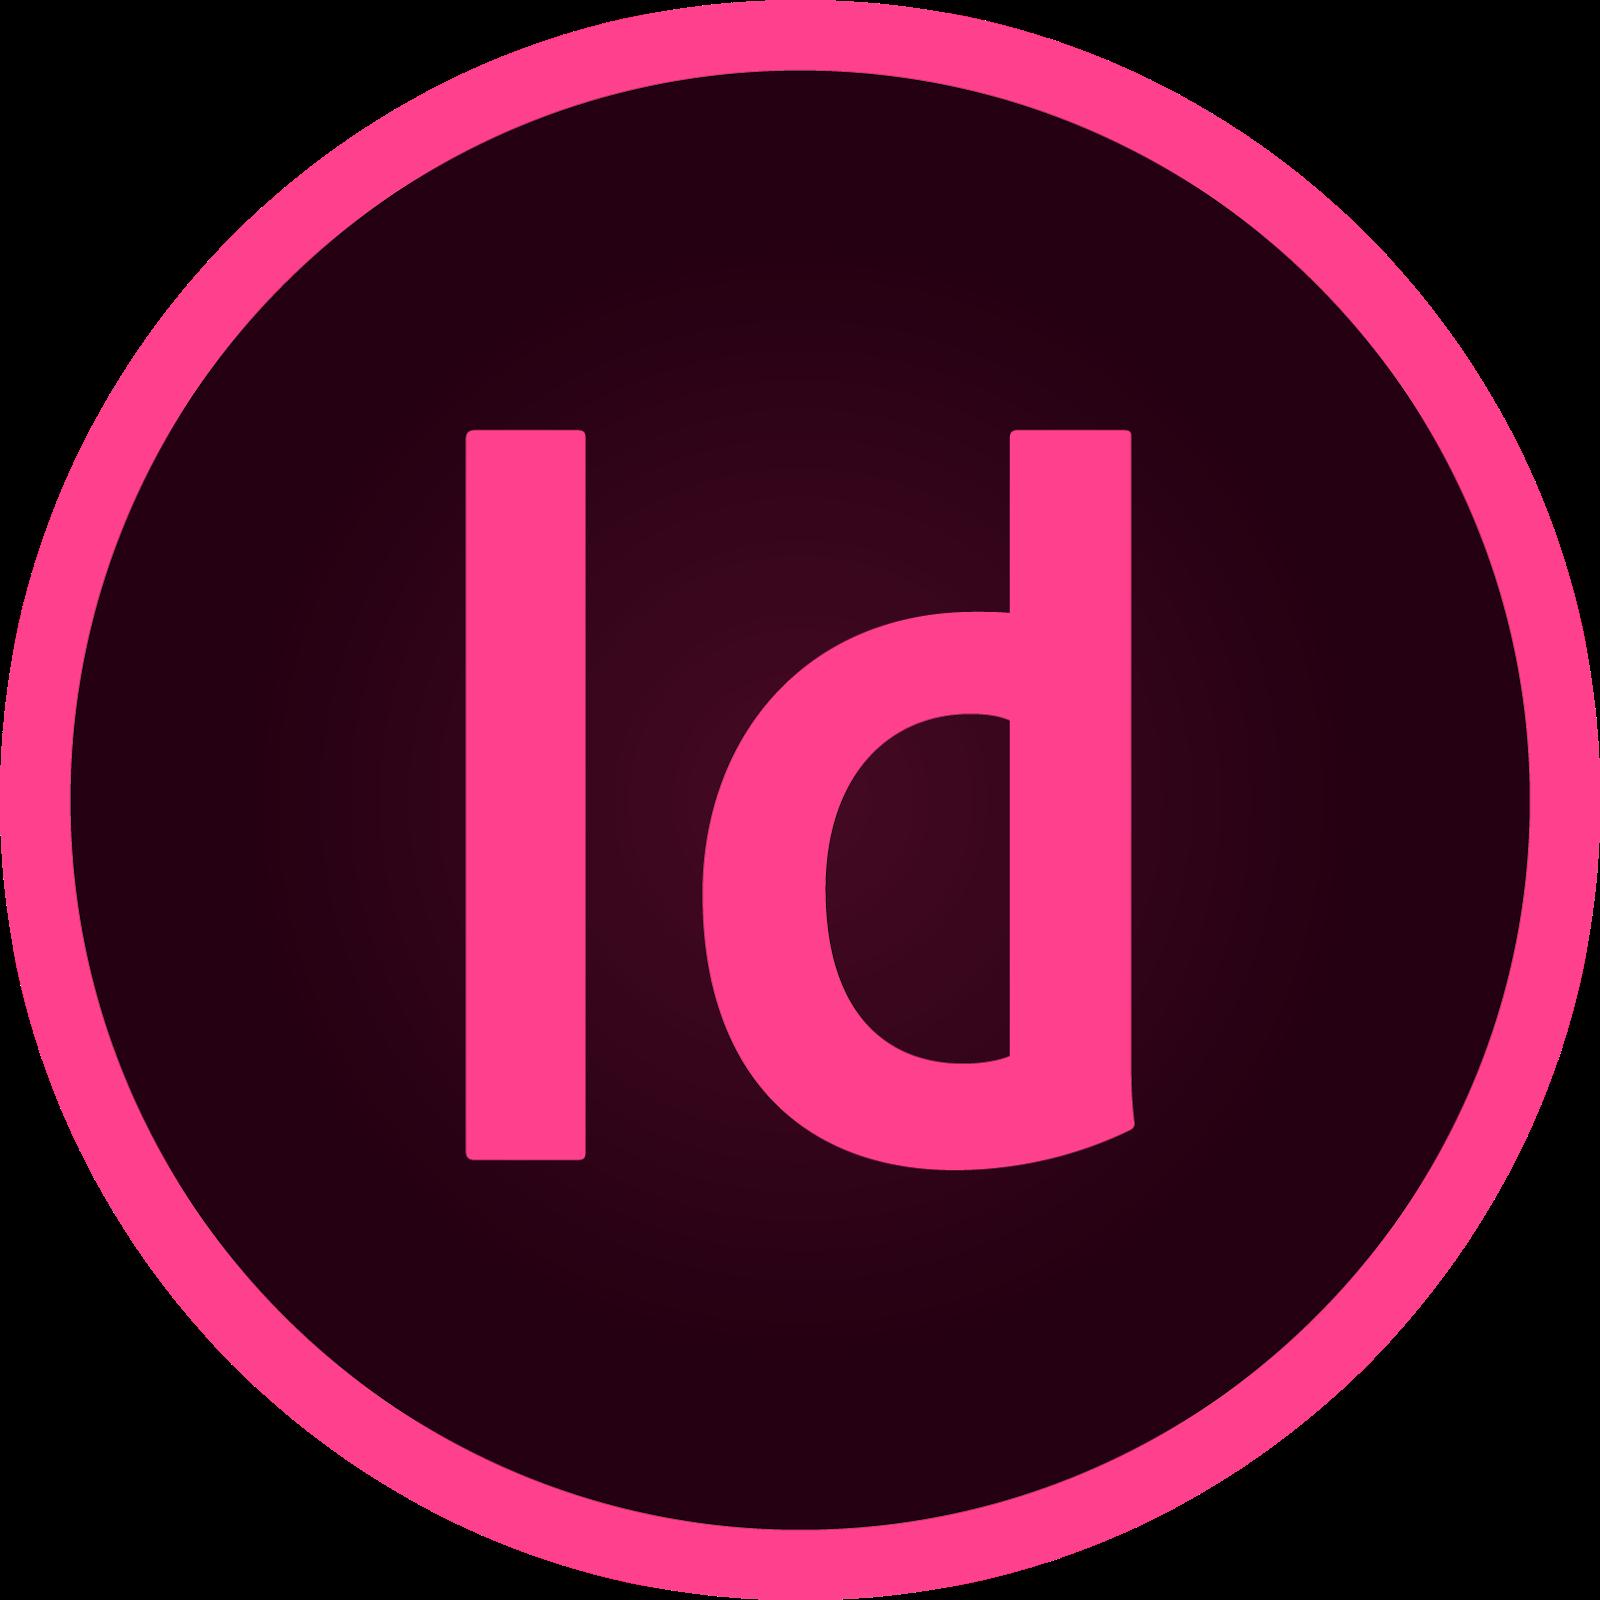 download logo adobe indesign cc icon svg eps png psd ai vector - el